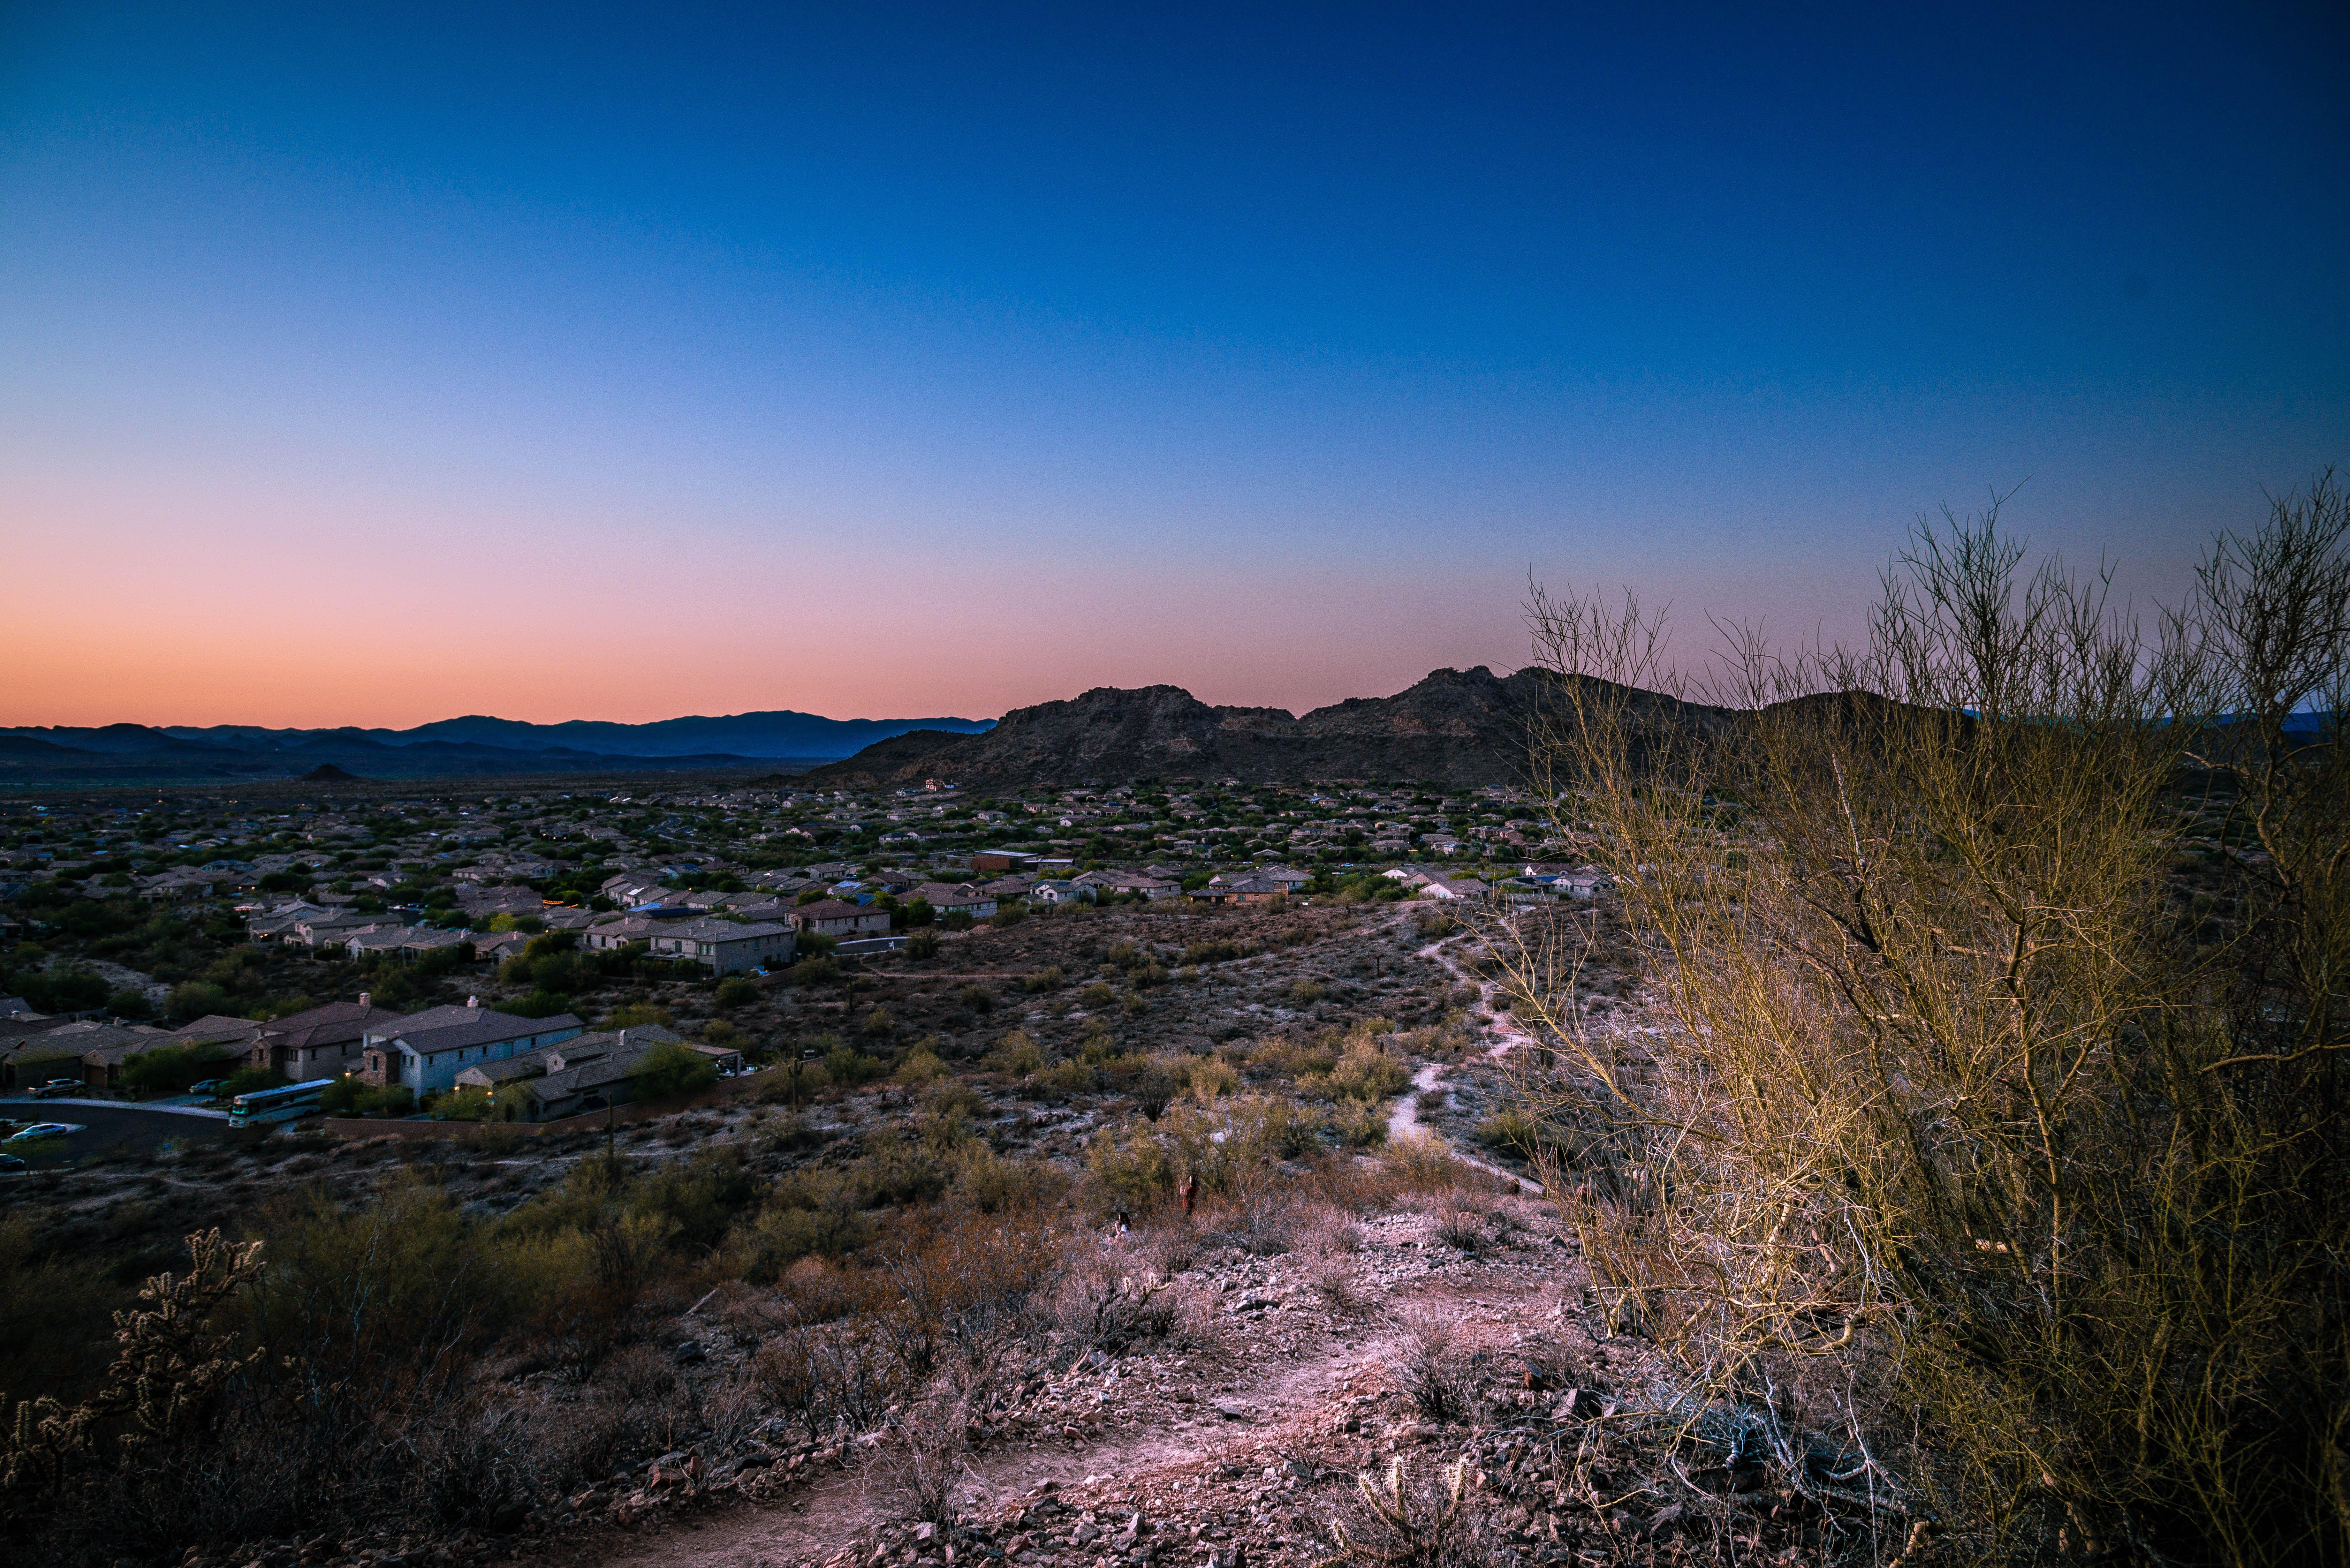 Free stock photo of sunset, desert, mountain, hiking